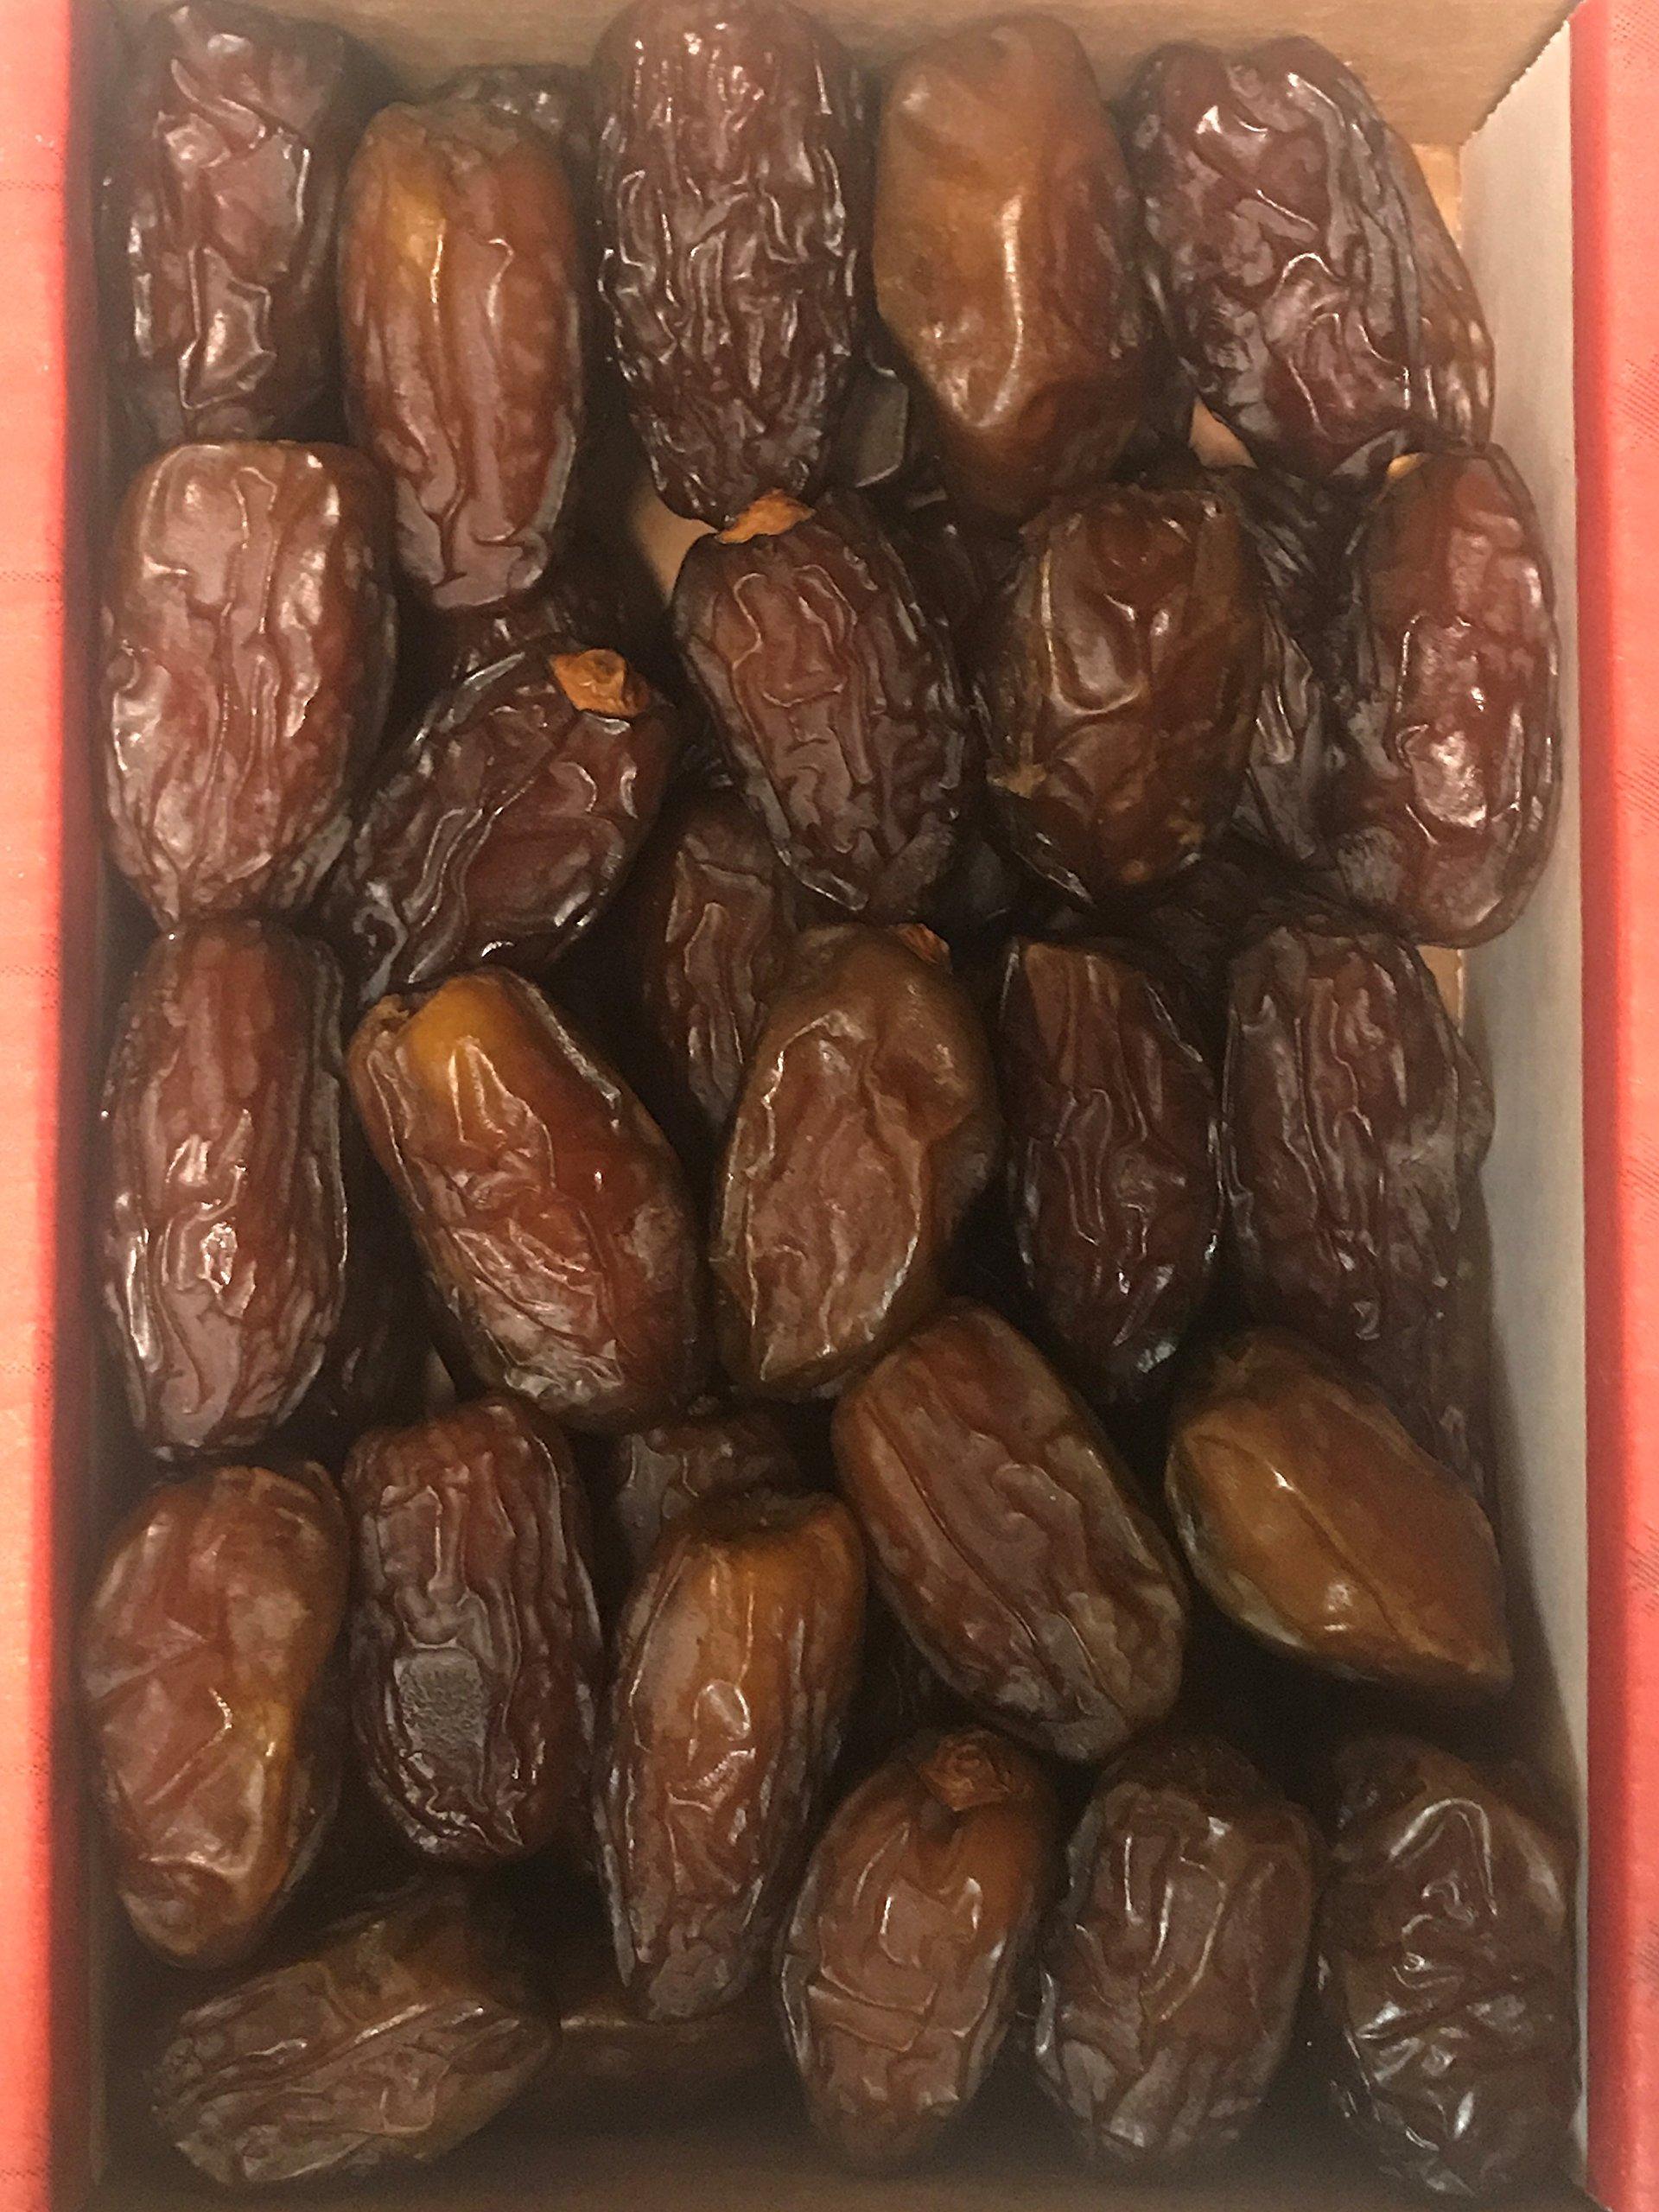 Medjool Dates, Fresh, Soft, Sweet, fom Aya Farms, 2 lb, تمر مدجول by Medjool (Image #1)